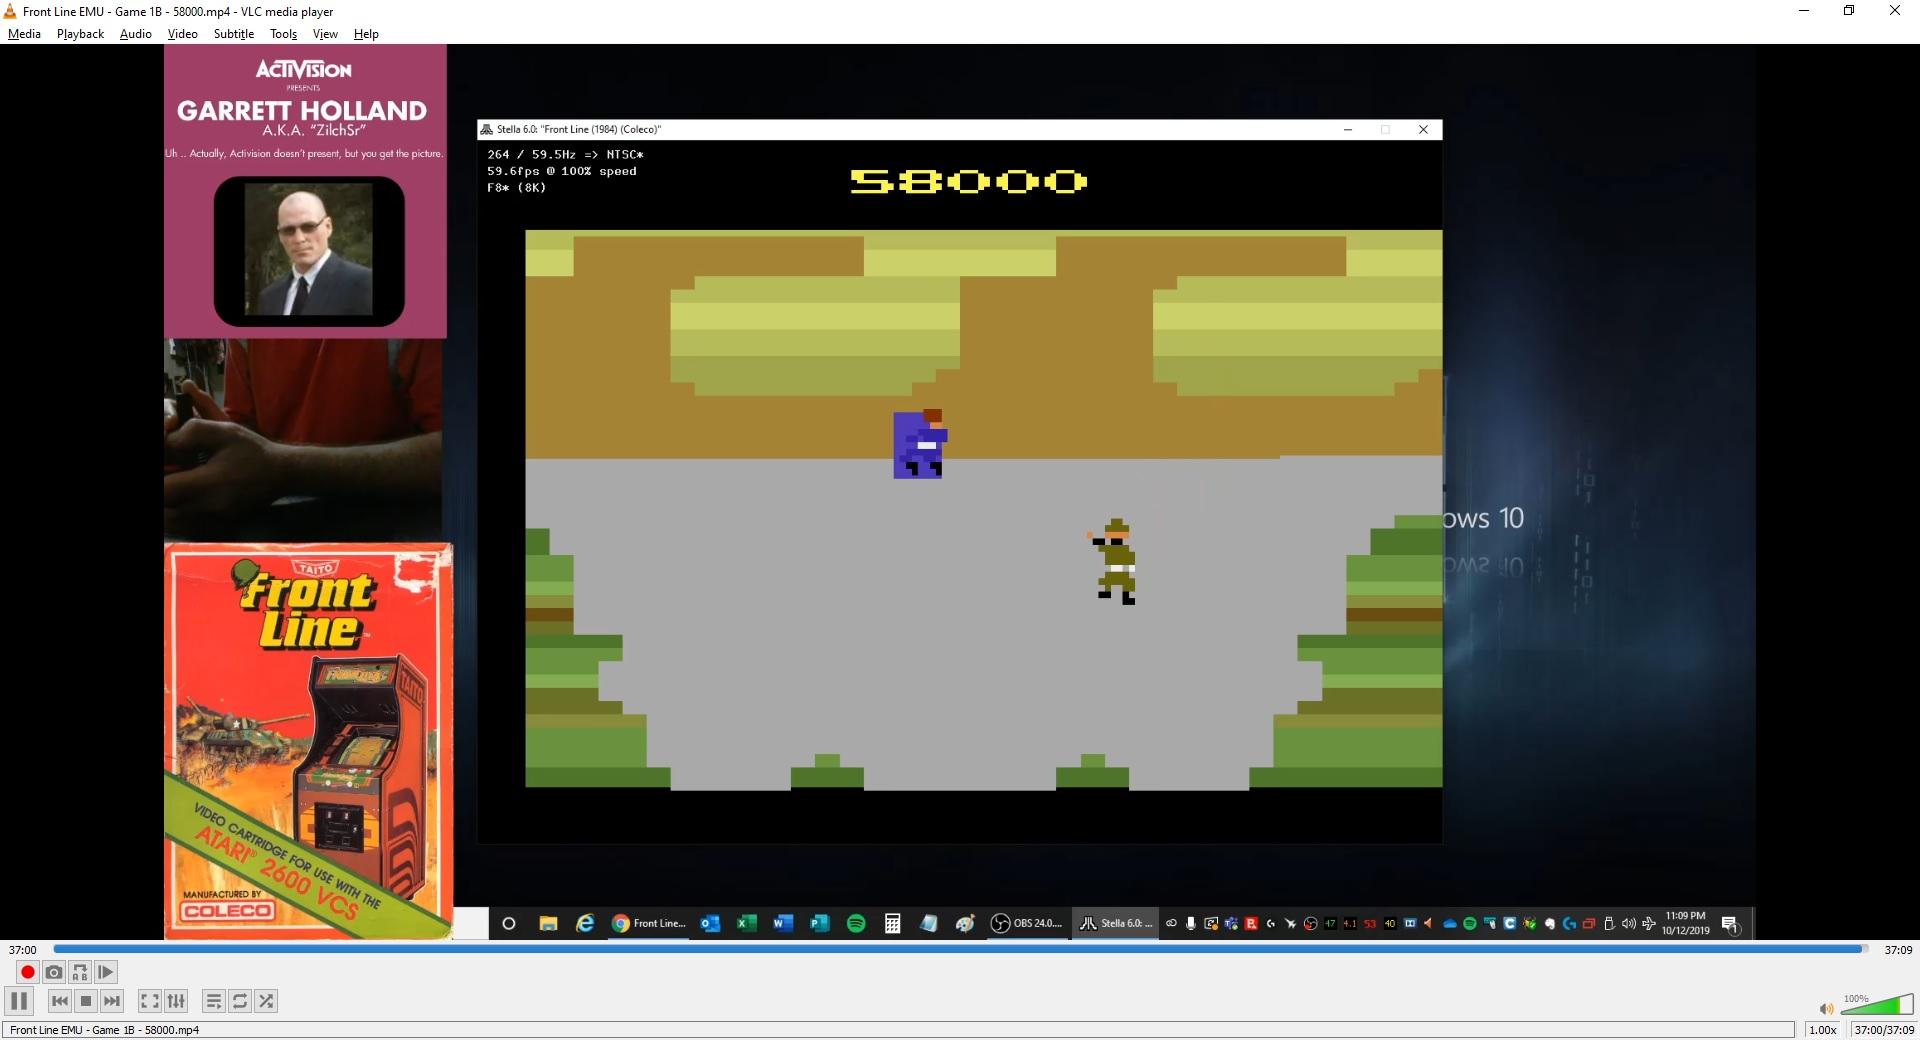 ZilchSr: Front Line (Atari 2600 Emulated Novice/B Mode) 58,000 points on 2019-10-13 23:50:10